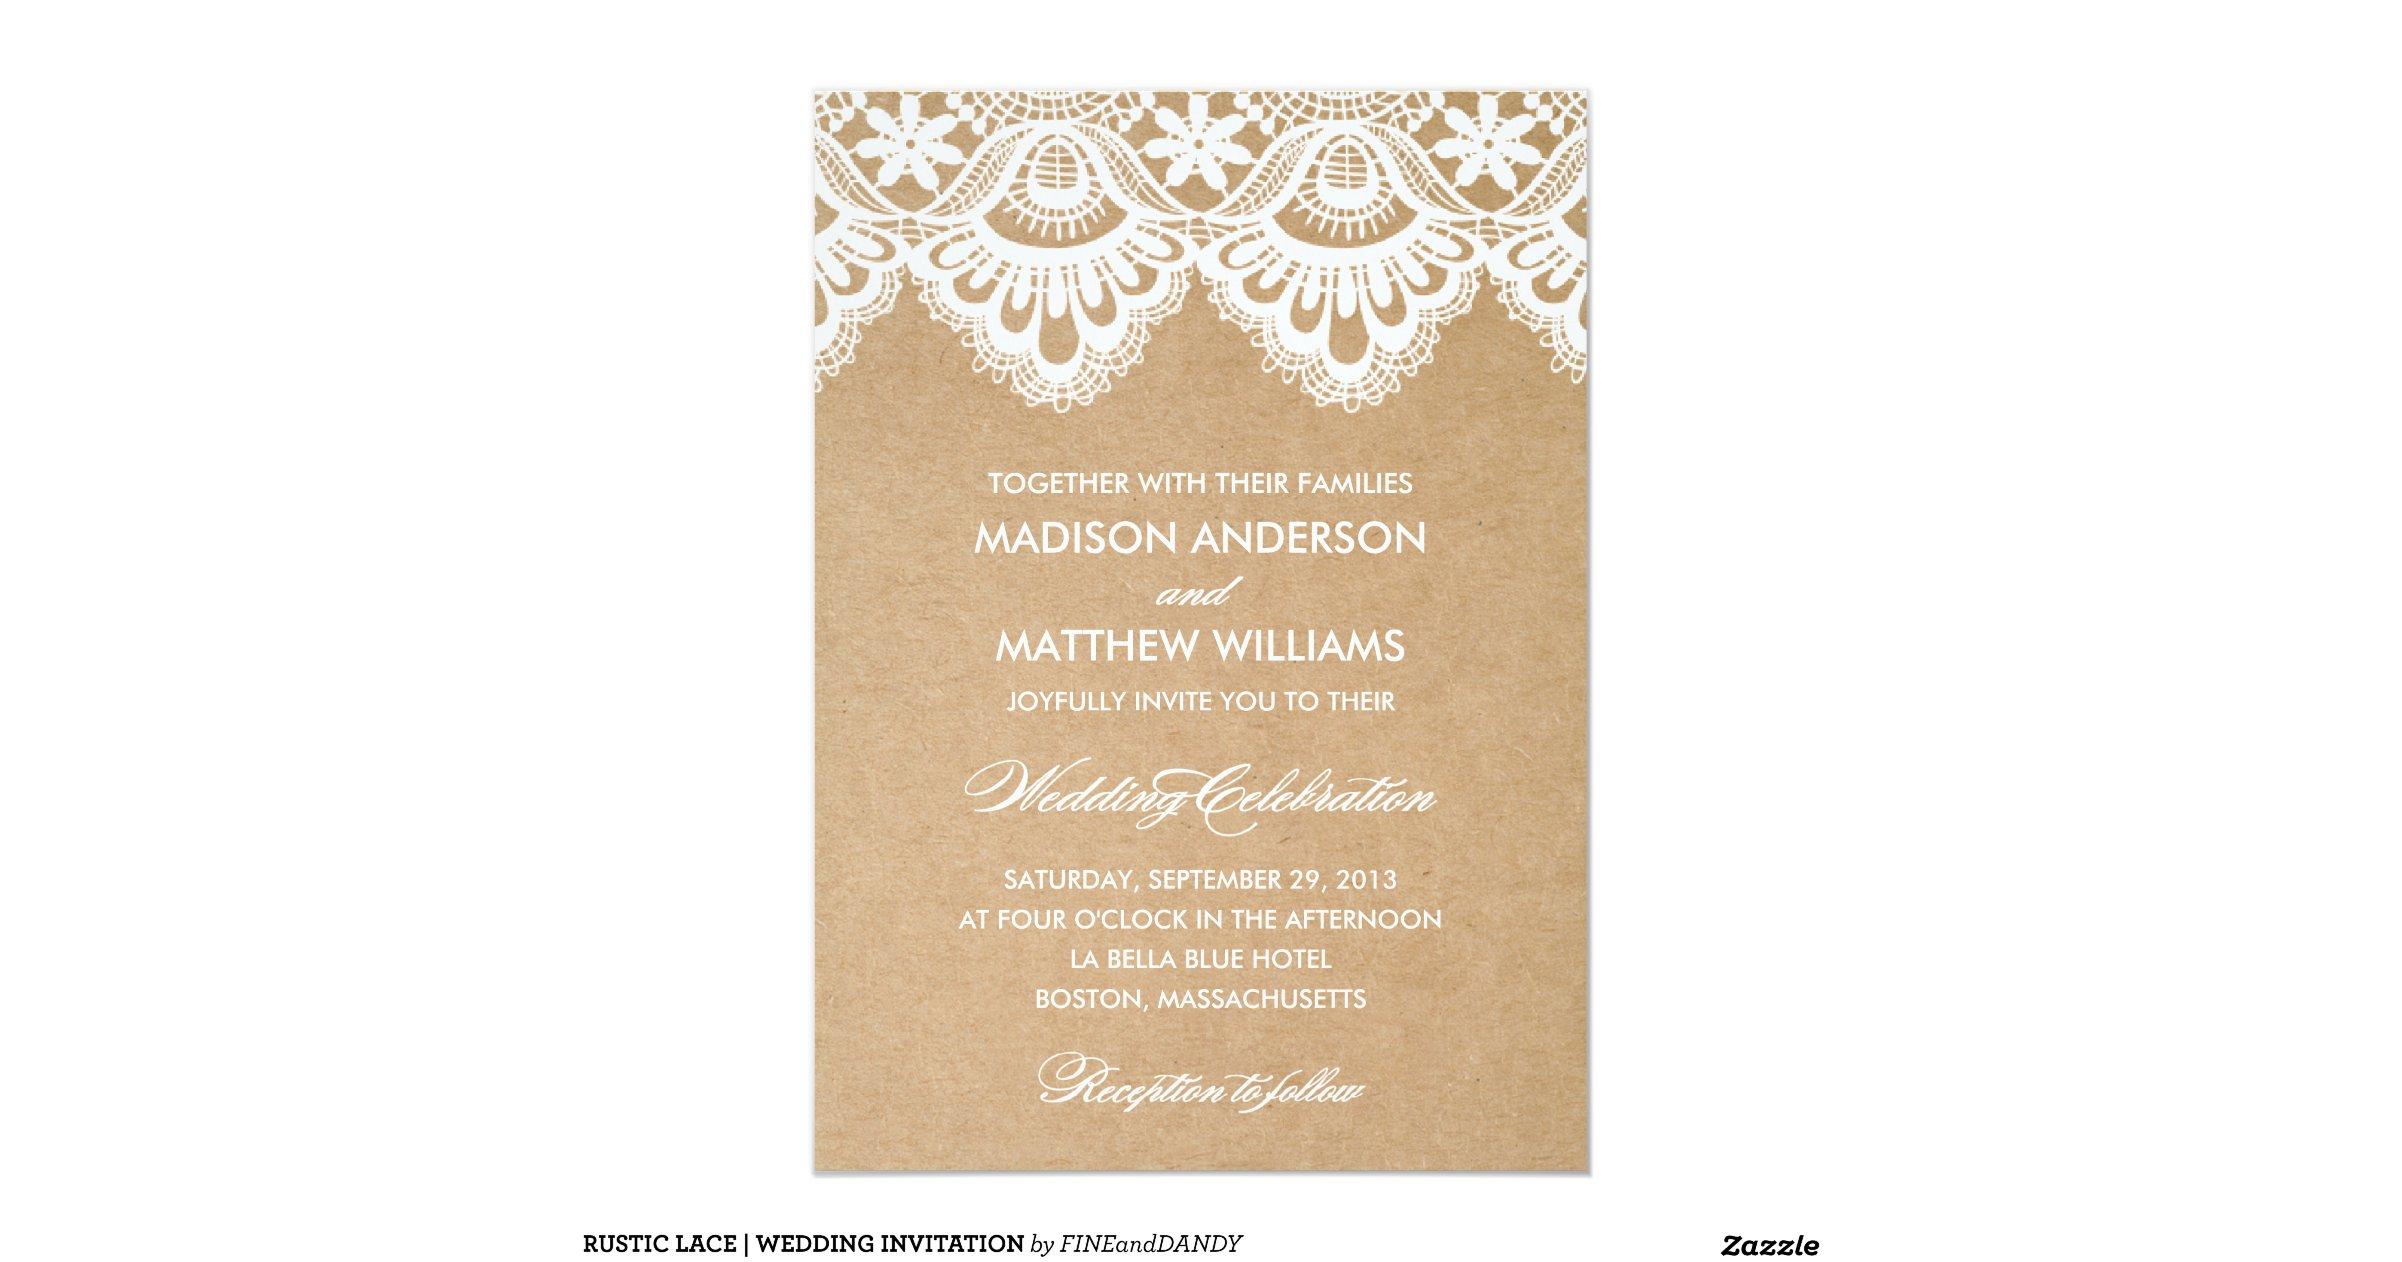 Free wedding invitation samples zazzle all the best ideas about art deco wedding invitations zazzle rusticlaceweddinginvitation rd775e166e953415e8465edb1b8f8c010zkrqs1200grlvnet1view stopboris Choice Image